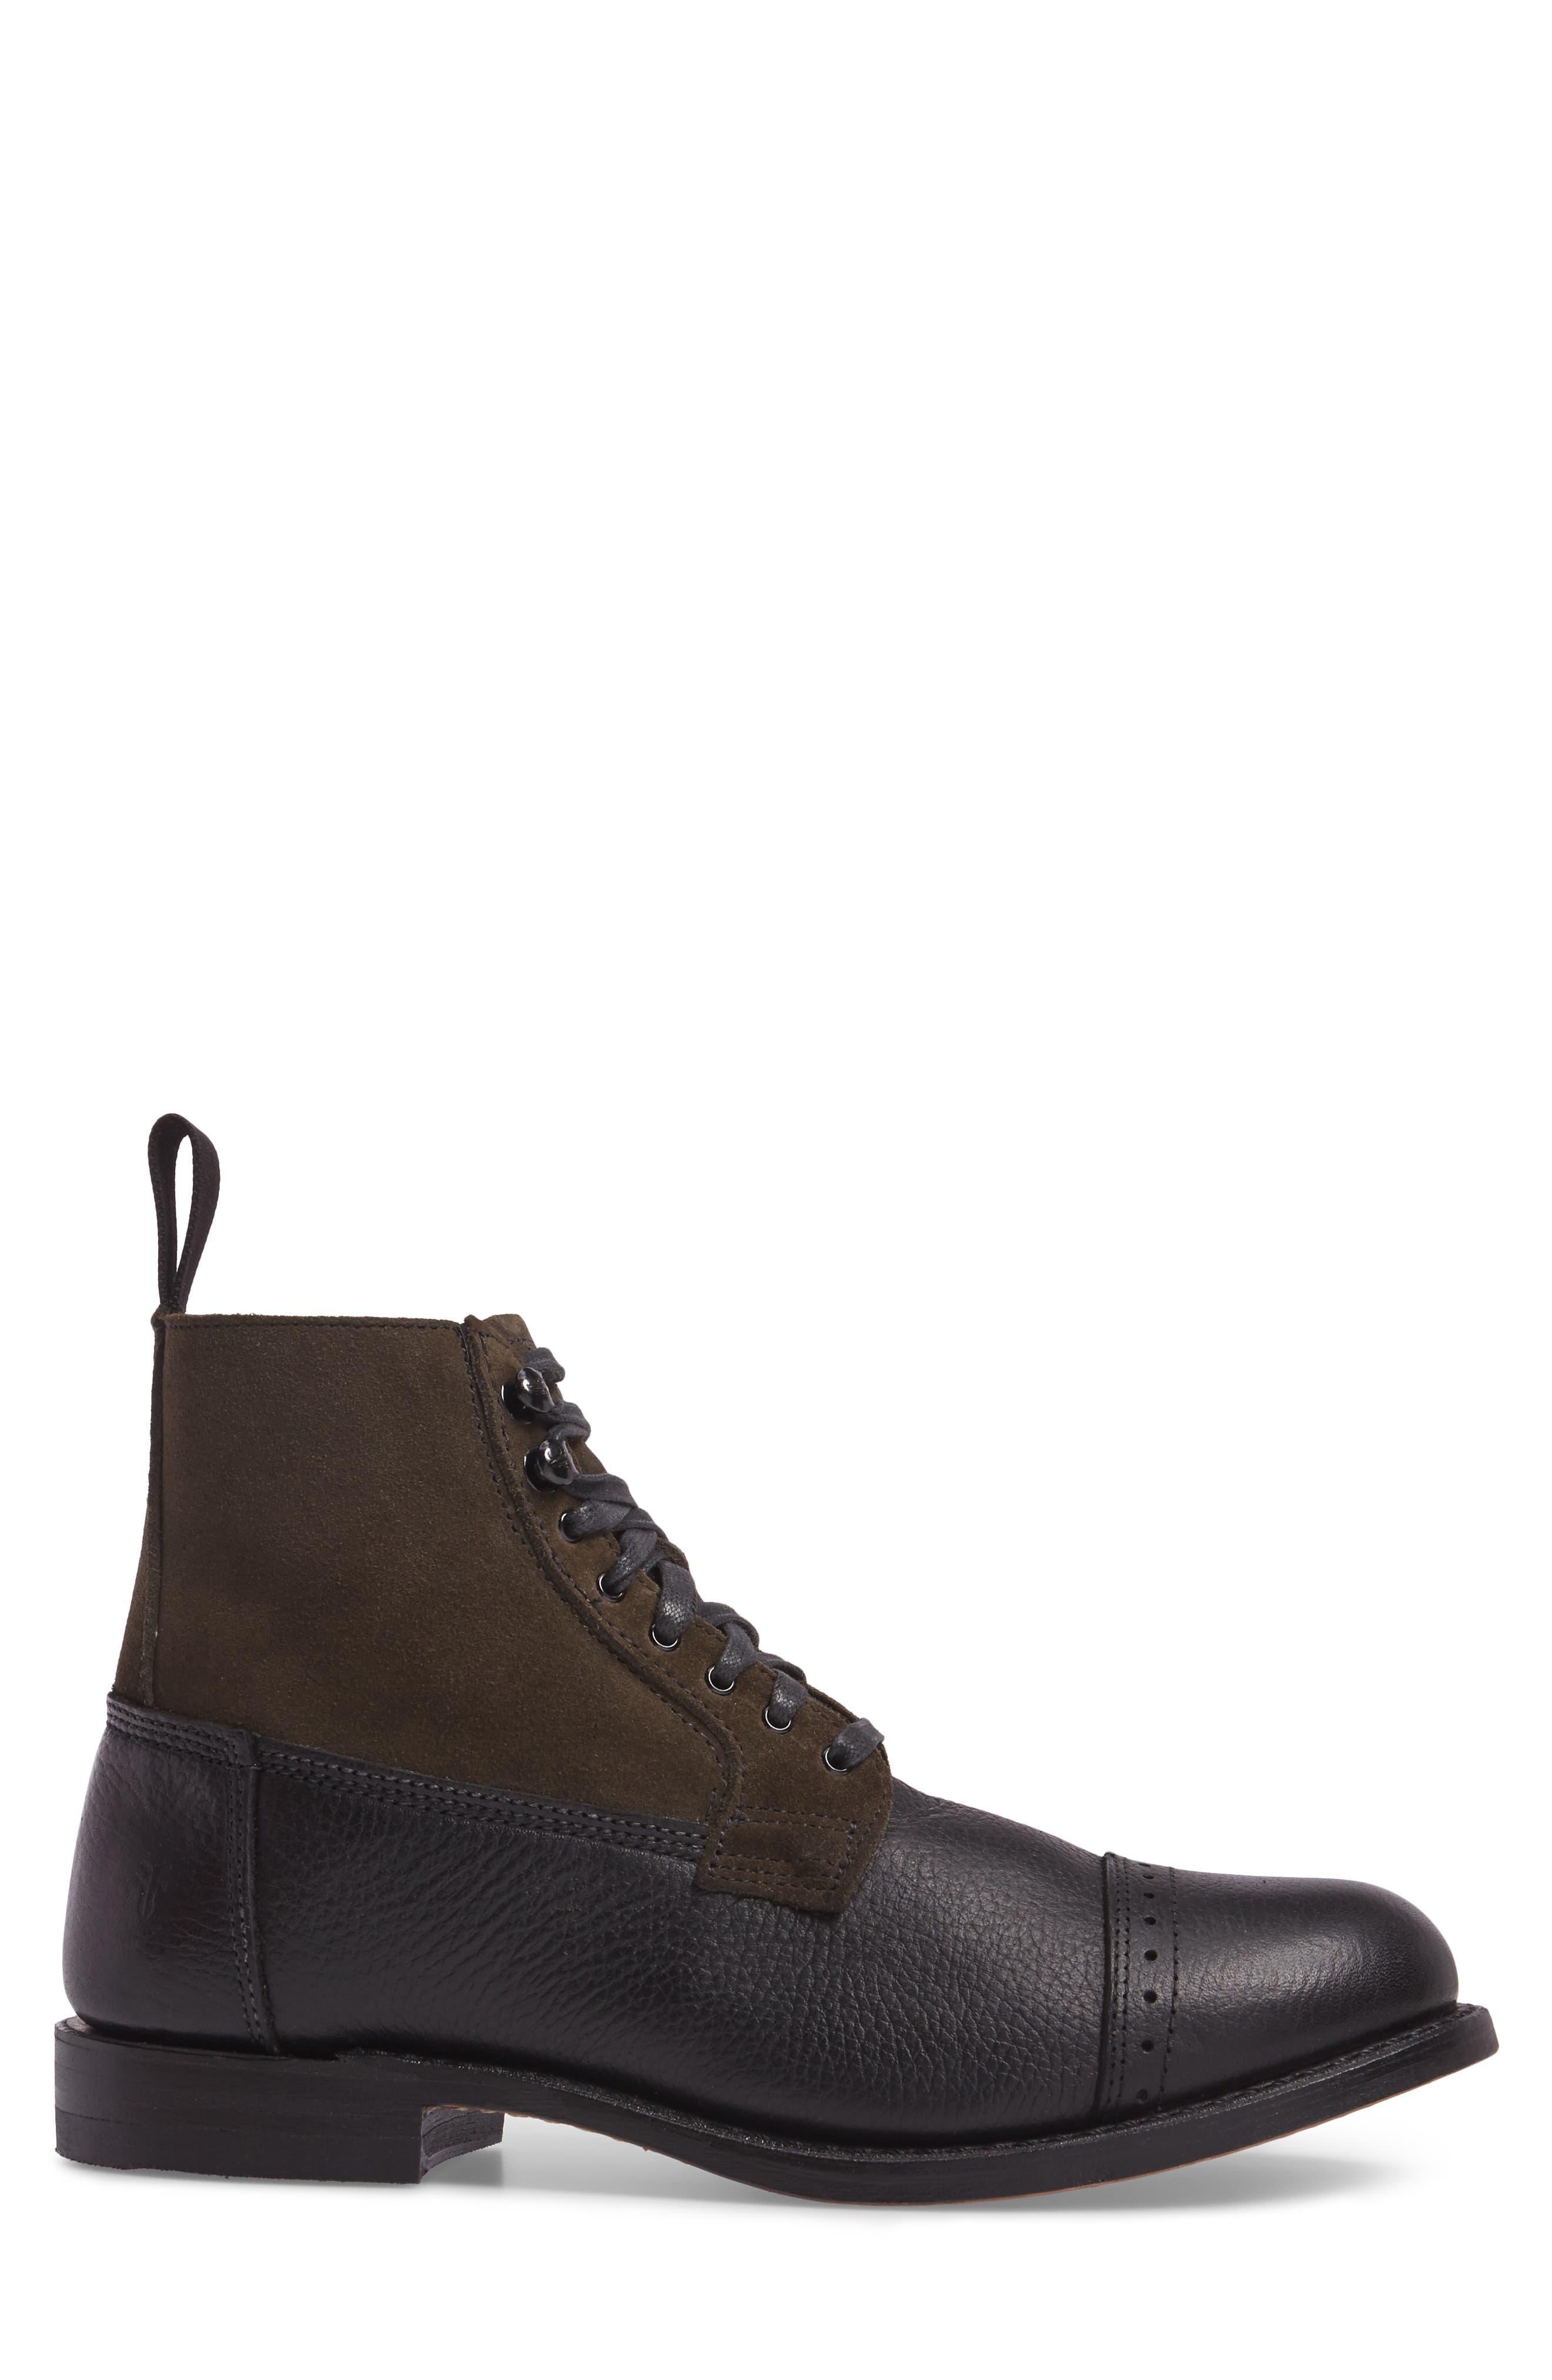 Frey Garrison Cap Toe Boot,                             Alternate thumbnail 3, color,                             Black Pebbled Leather